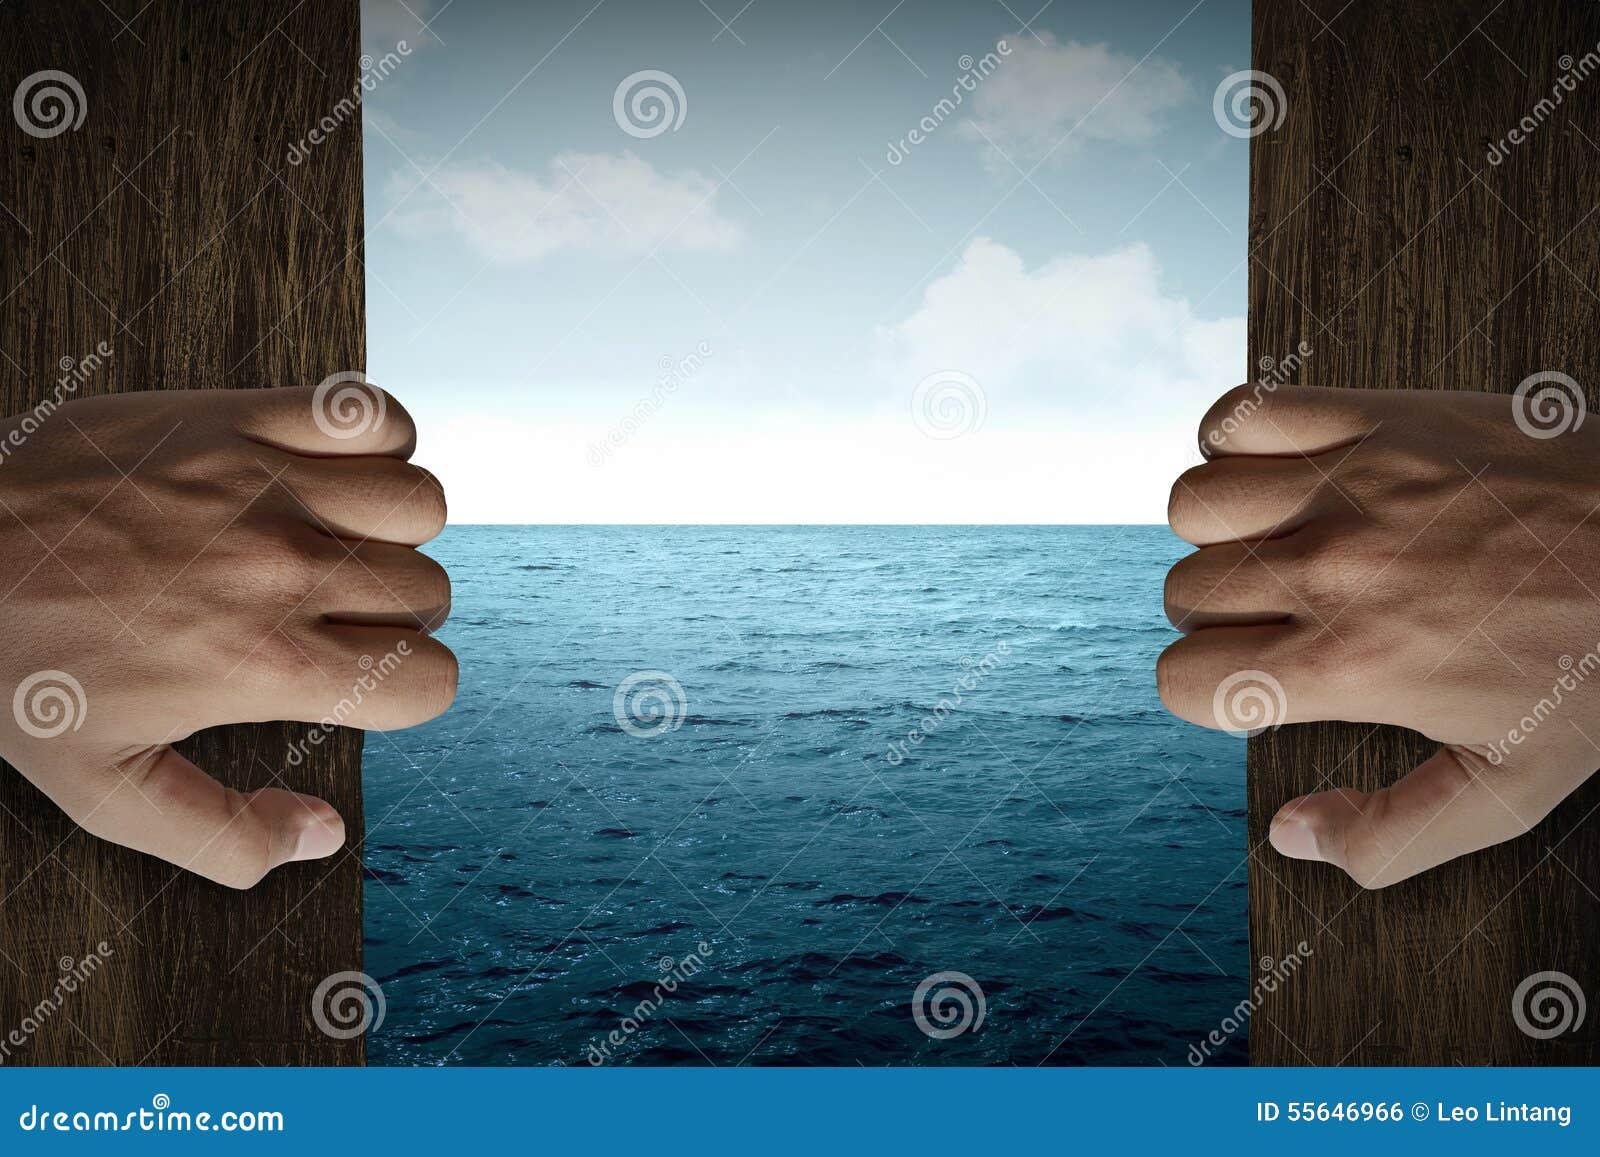 Man Hand Open Door Into The Sea Stock Photo Image Of